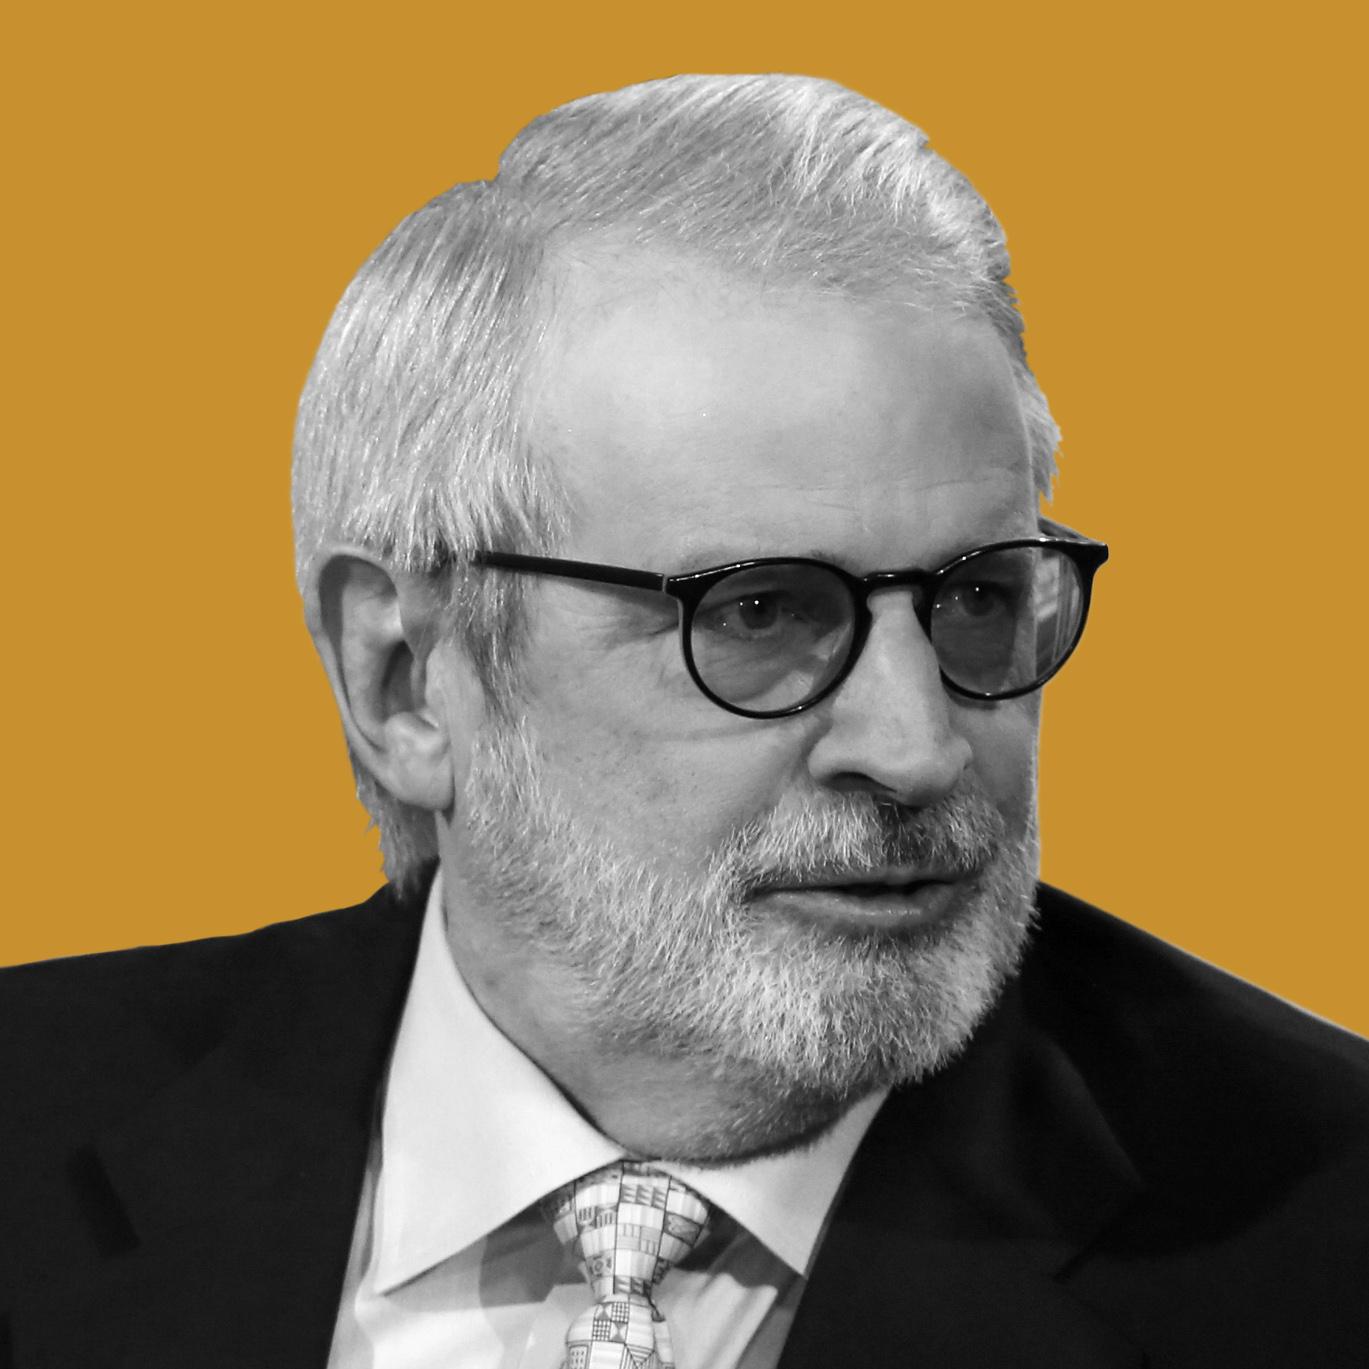 Former U.S. Budget Director David Stockman Interview